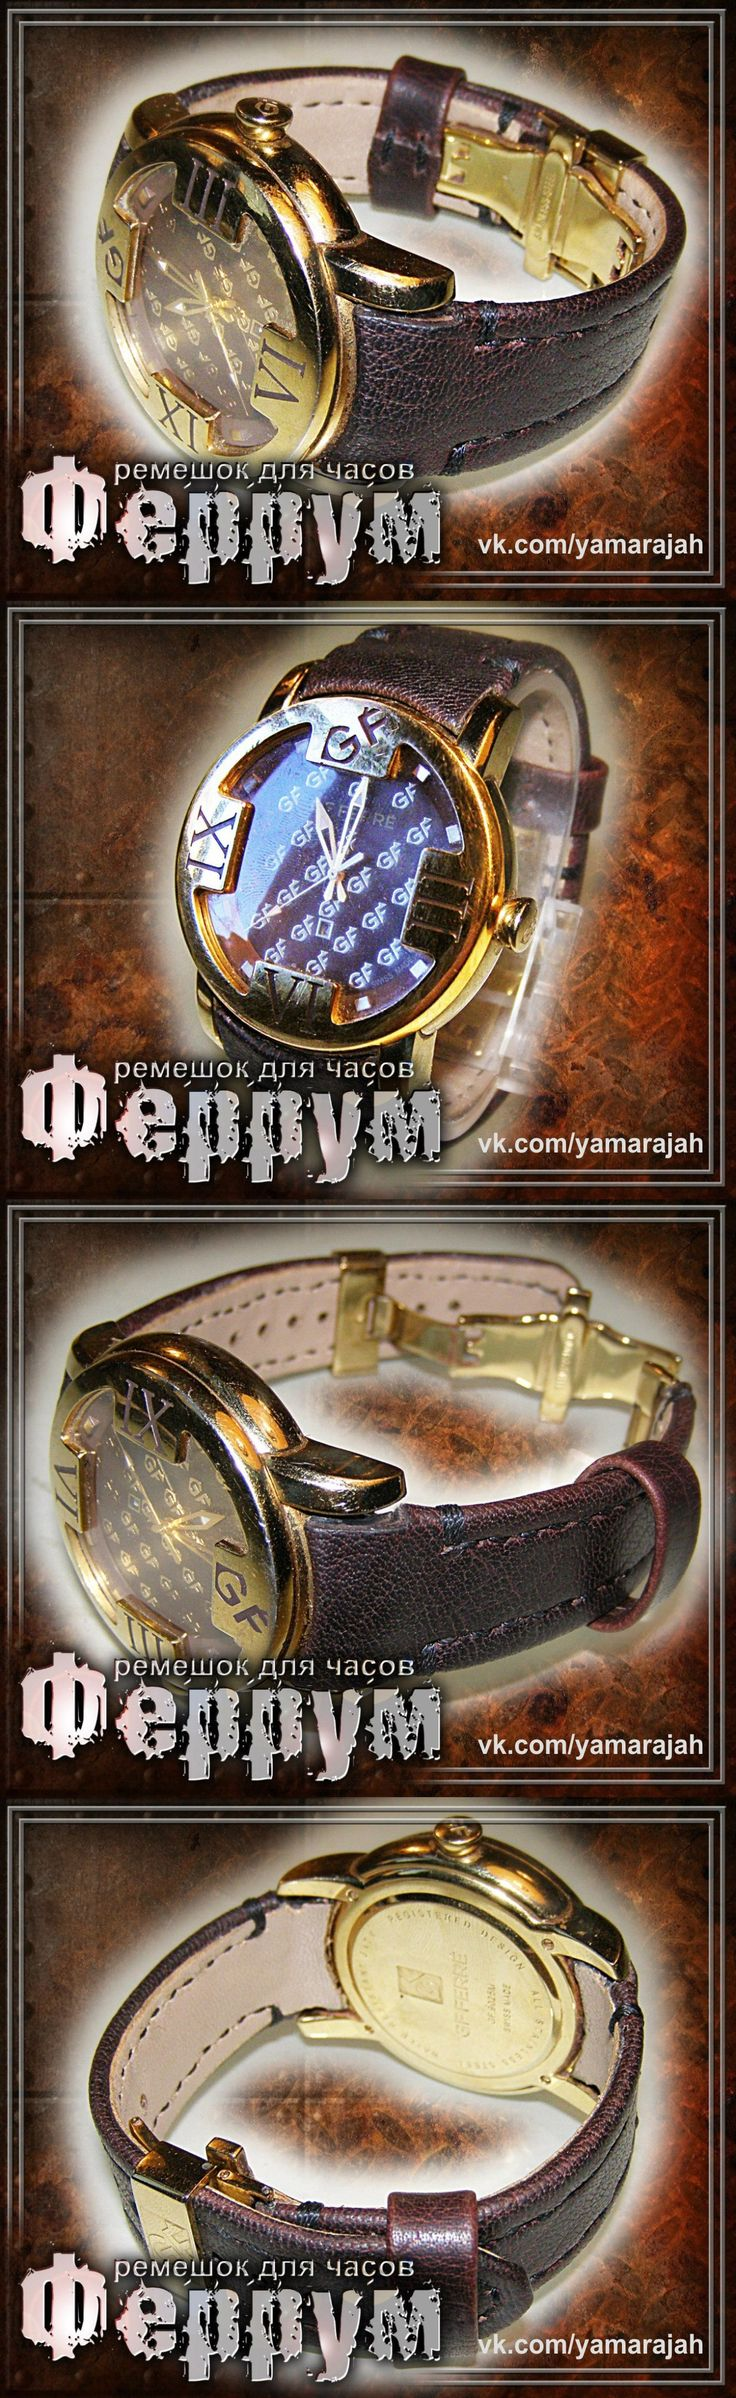 https://vk.com/maharajah Watchband GF Ferre. Buffalo leather lining, waxed thread firmware in two needles. Ремешок для часов GF Ferre. Буйволиная кожа, подклад, прошивка вощеной нитью в две иглы.